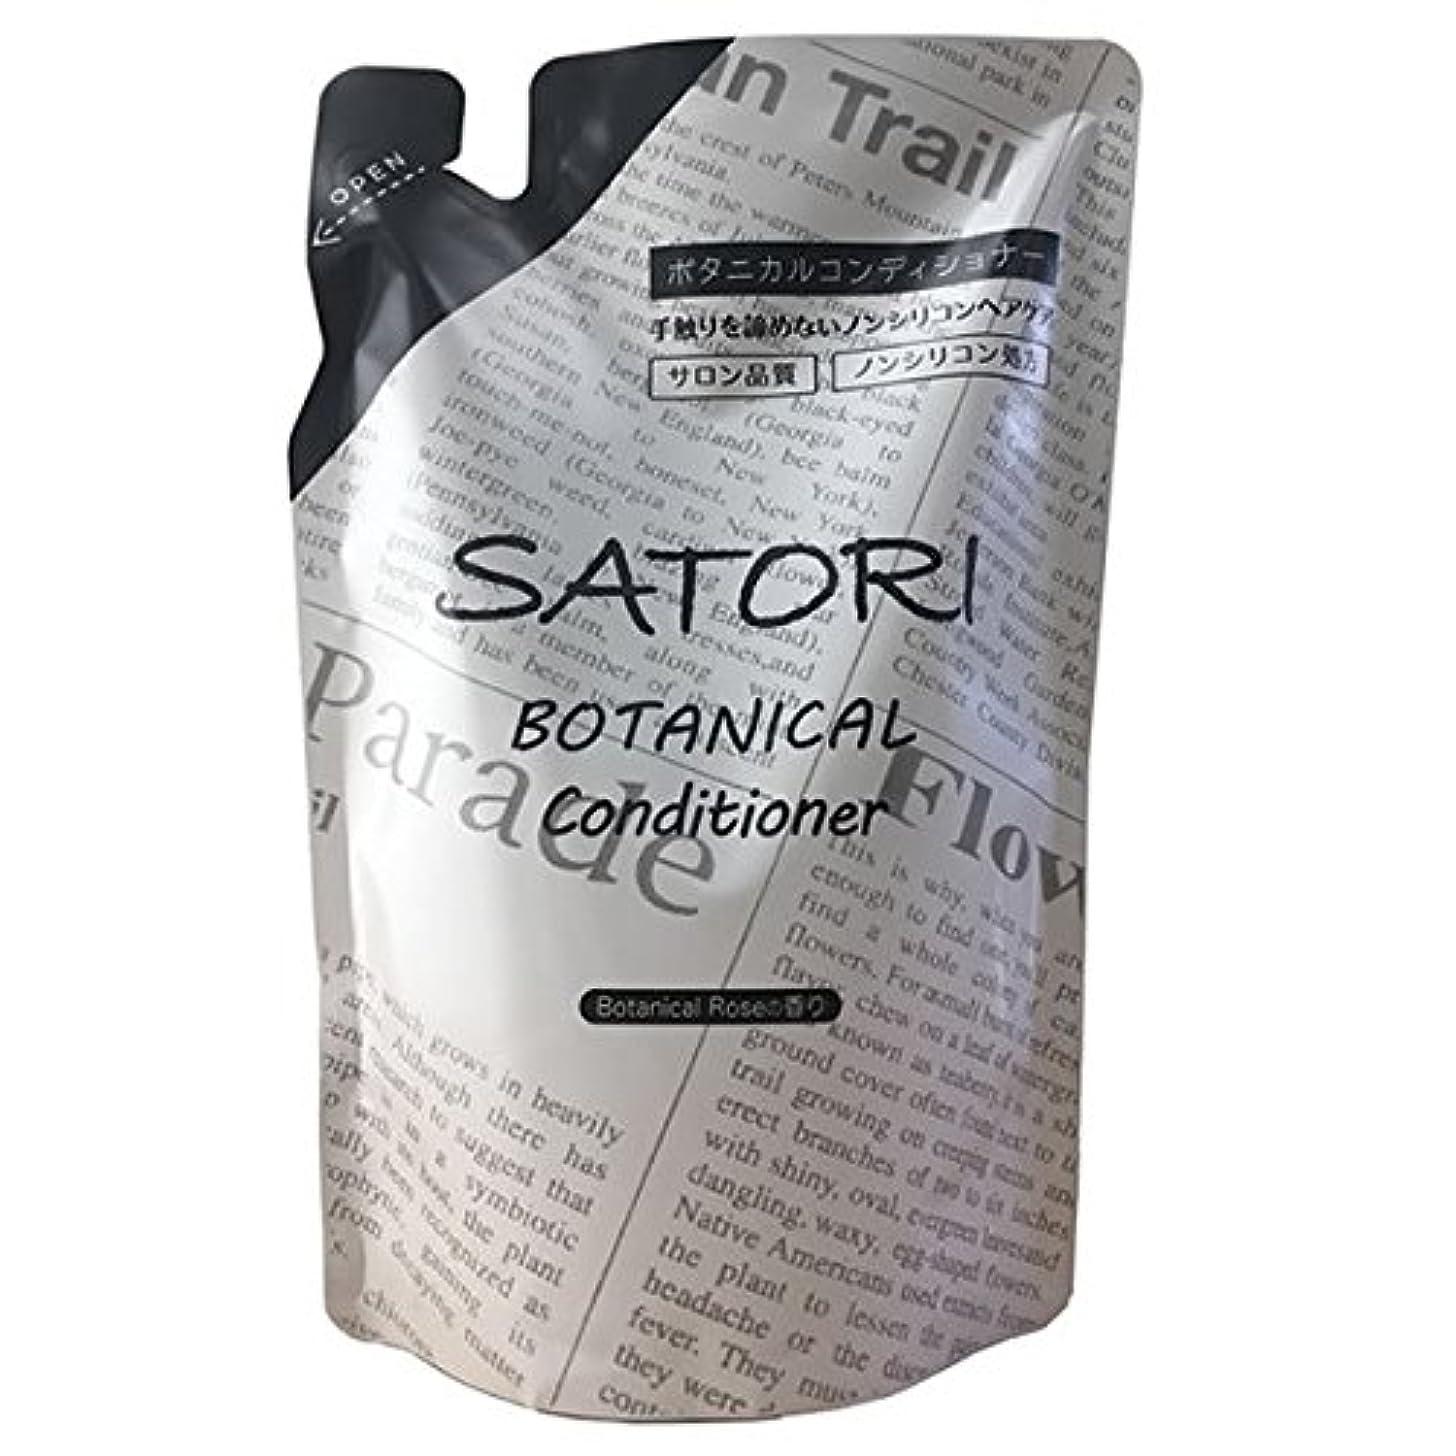 SATORI(サトリ) ボタニカルコンディショナー レフィル 400ml